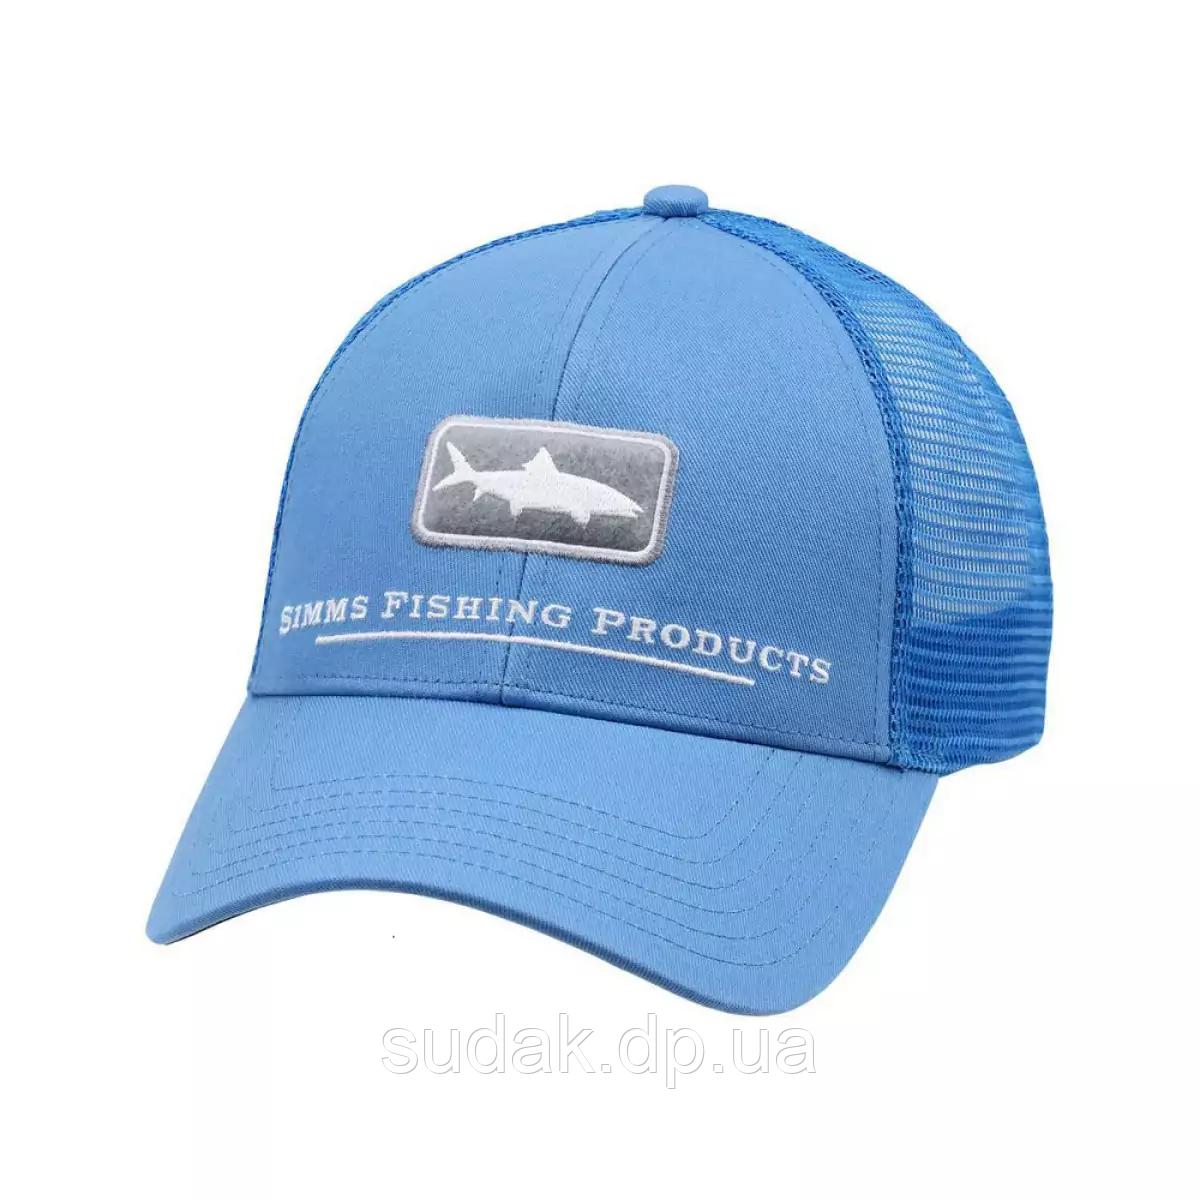 Кепка Simms Bonefish Icon Trucker Pacific